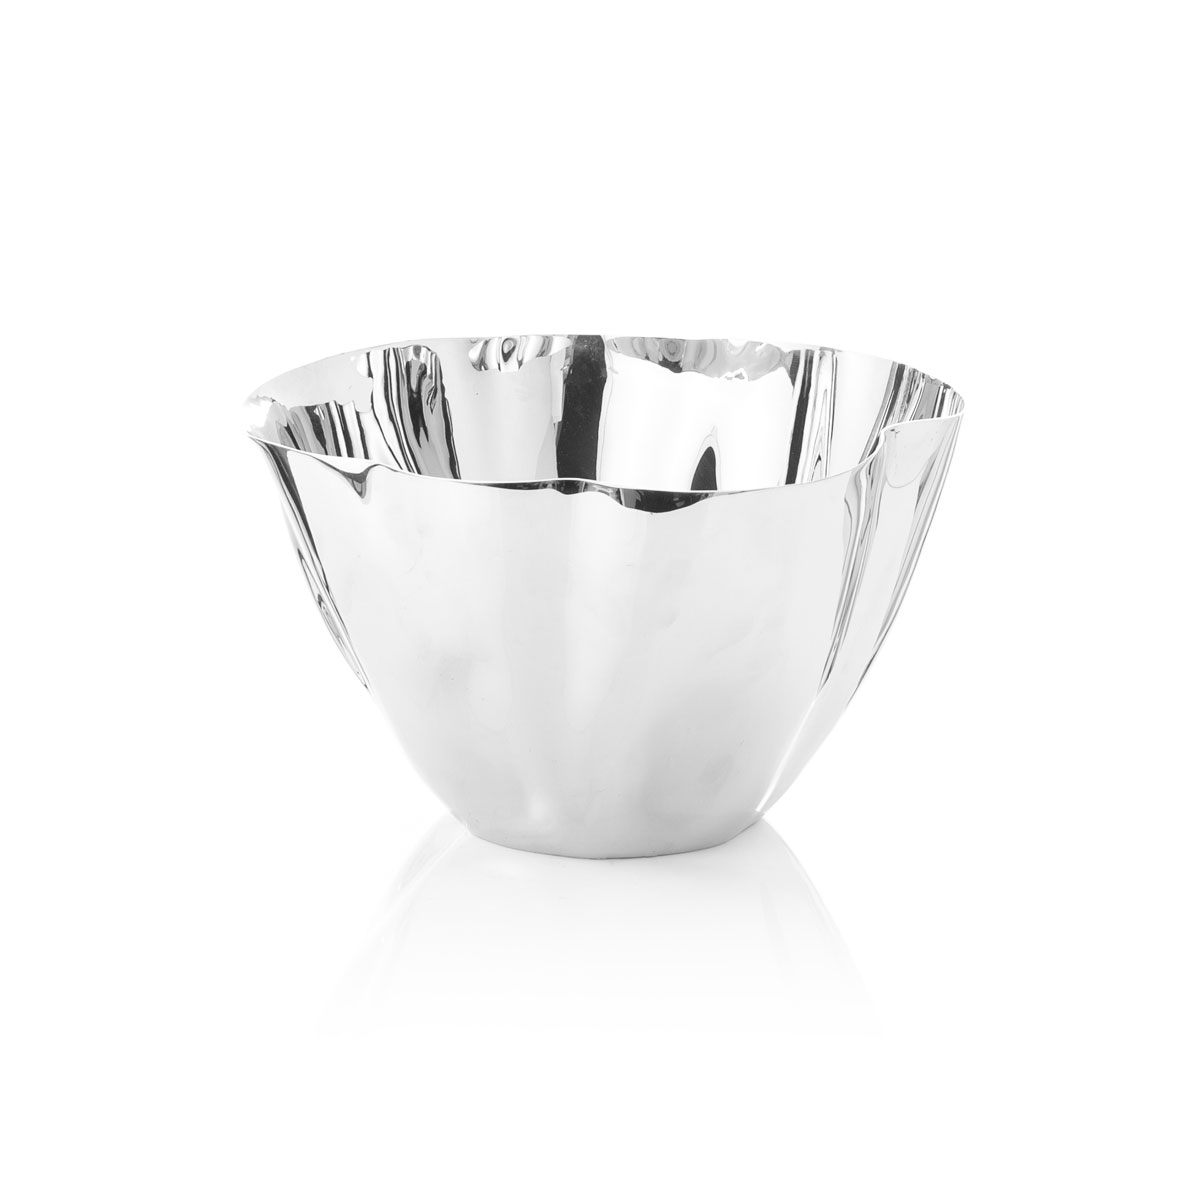 "Michael Aram Lotus Pod 10"" Bowl"